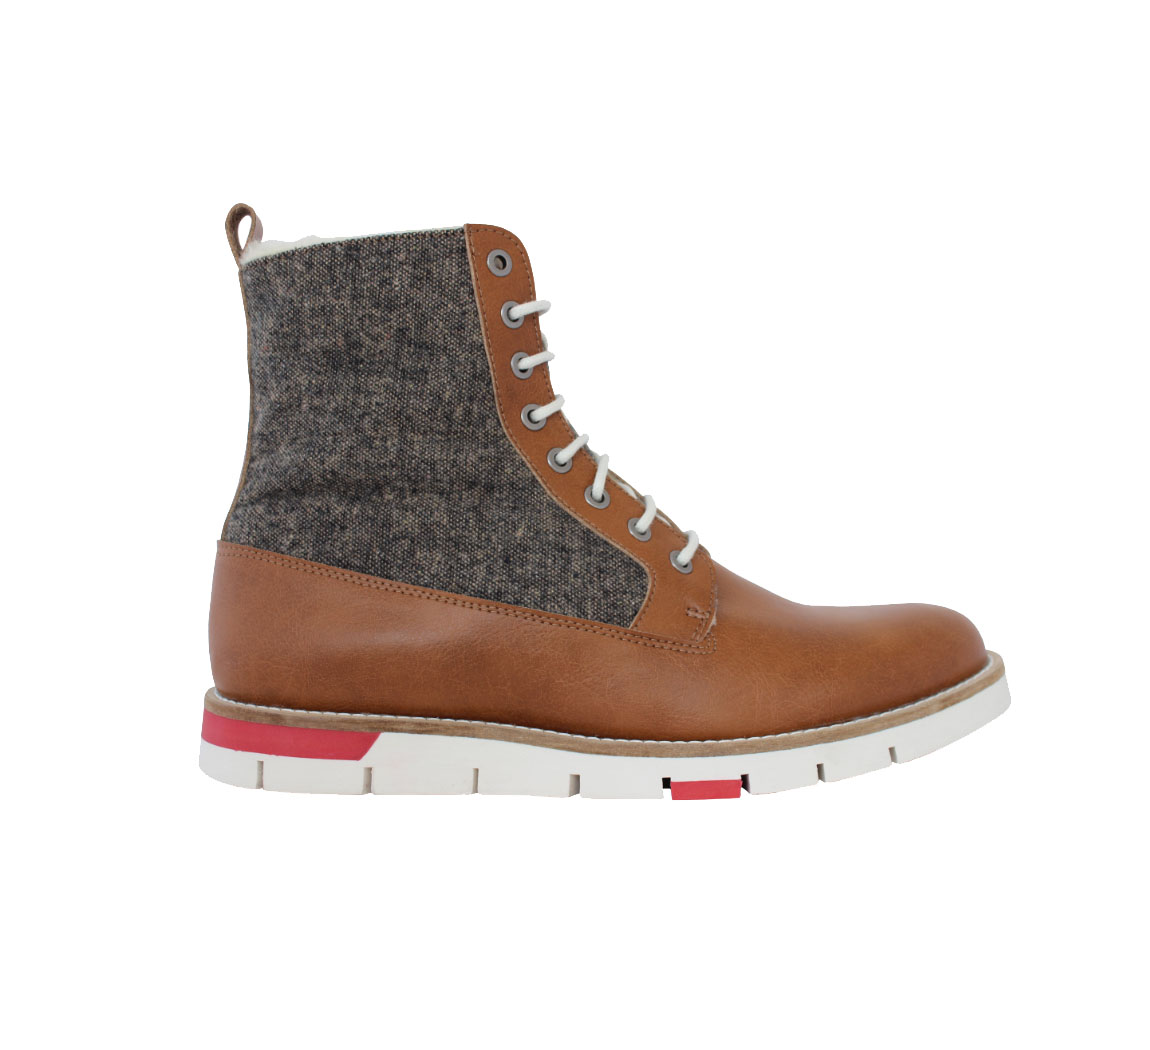 Chaussure vegan montante pour homme Walker boot